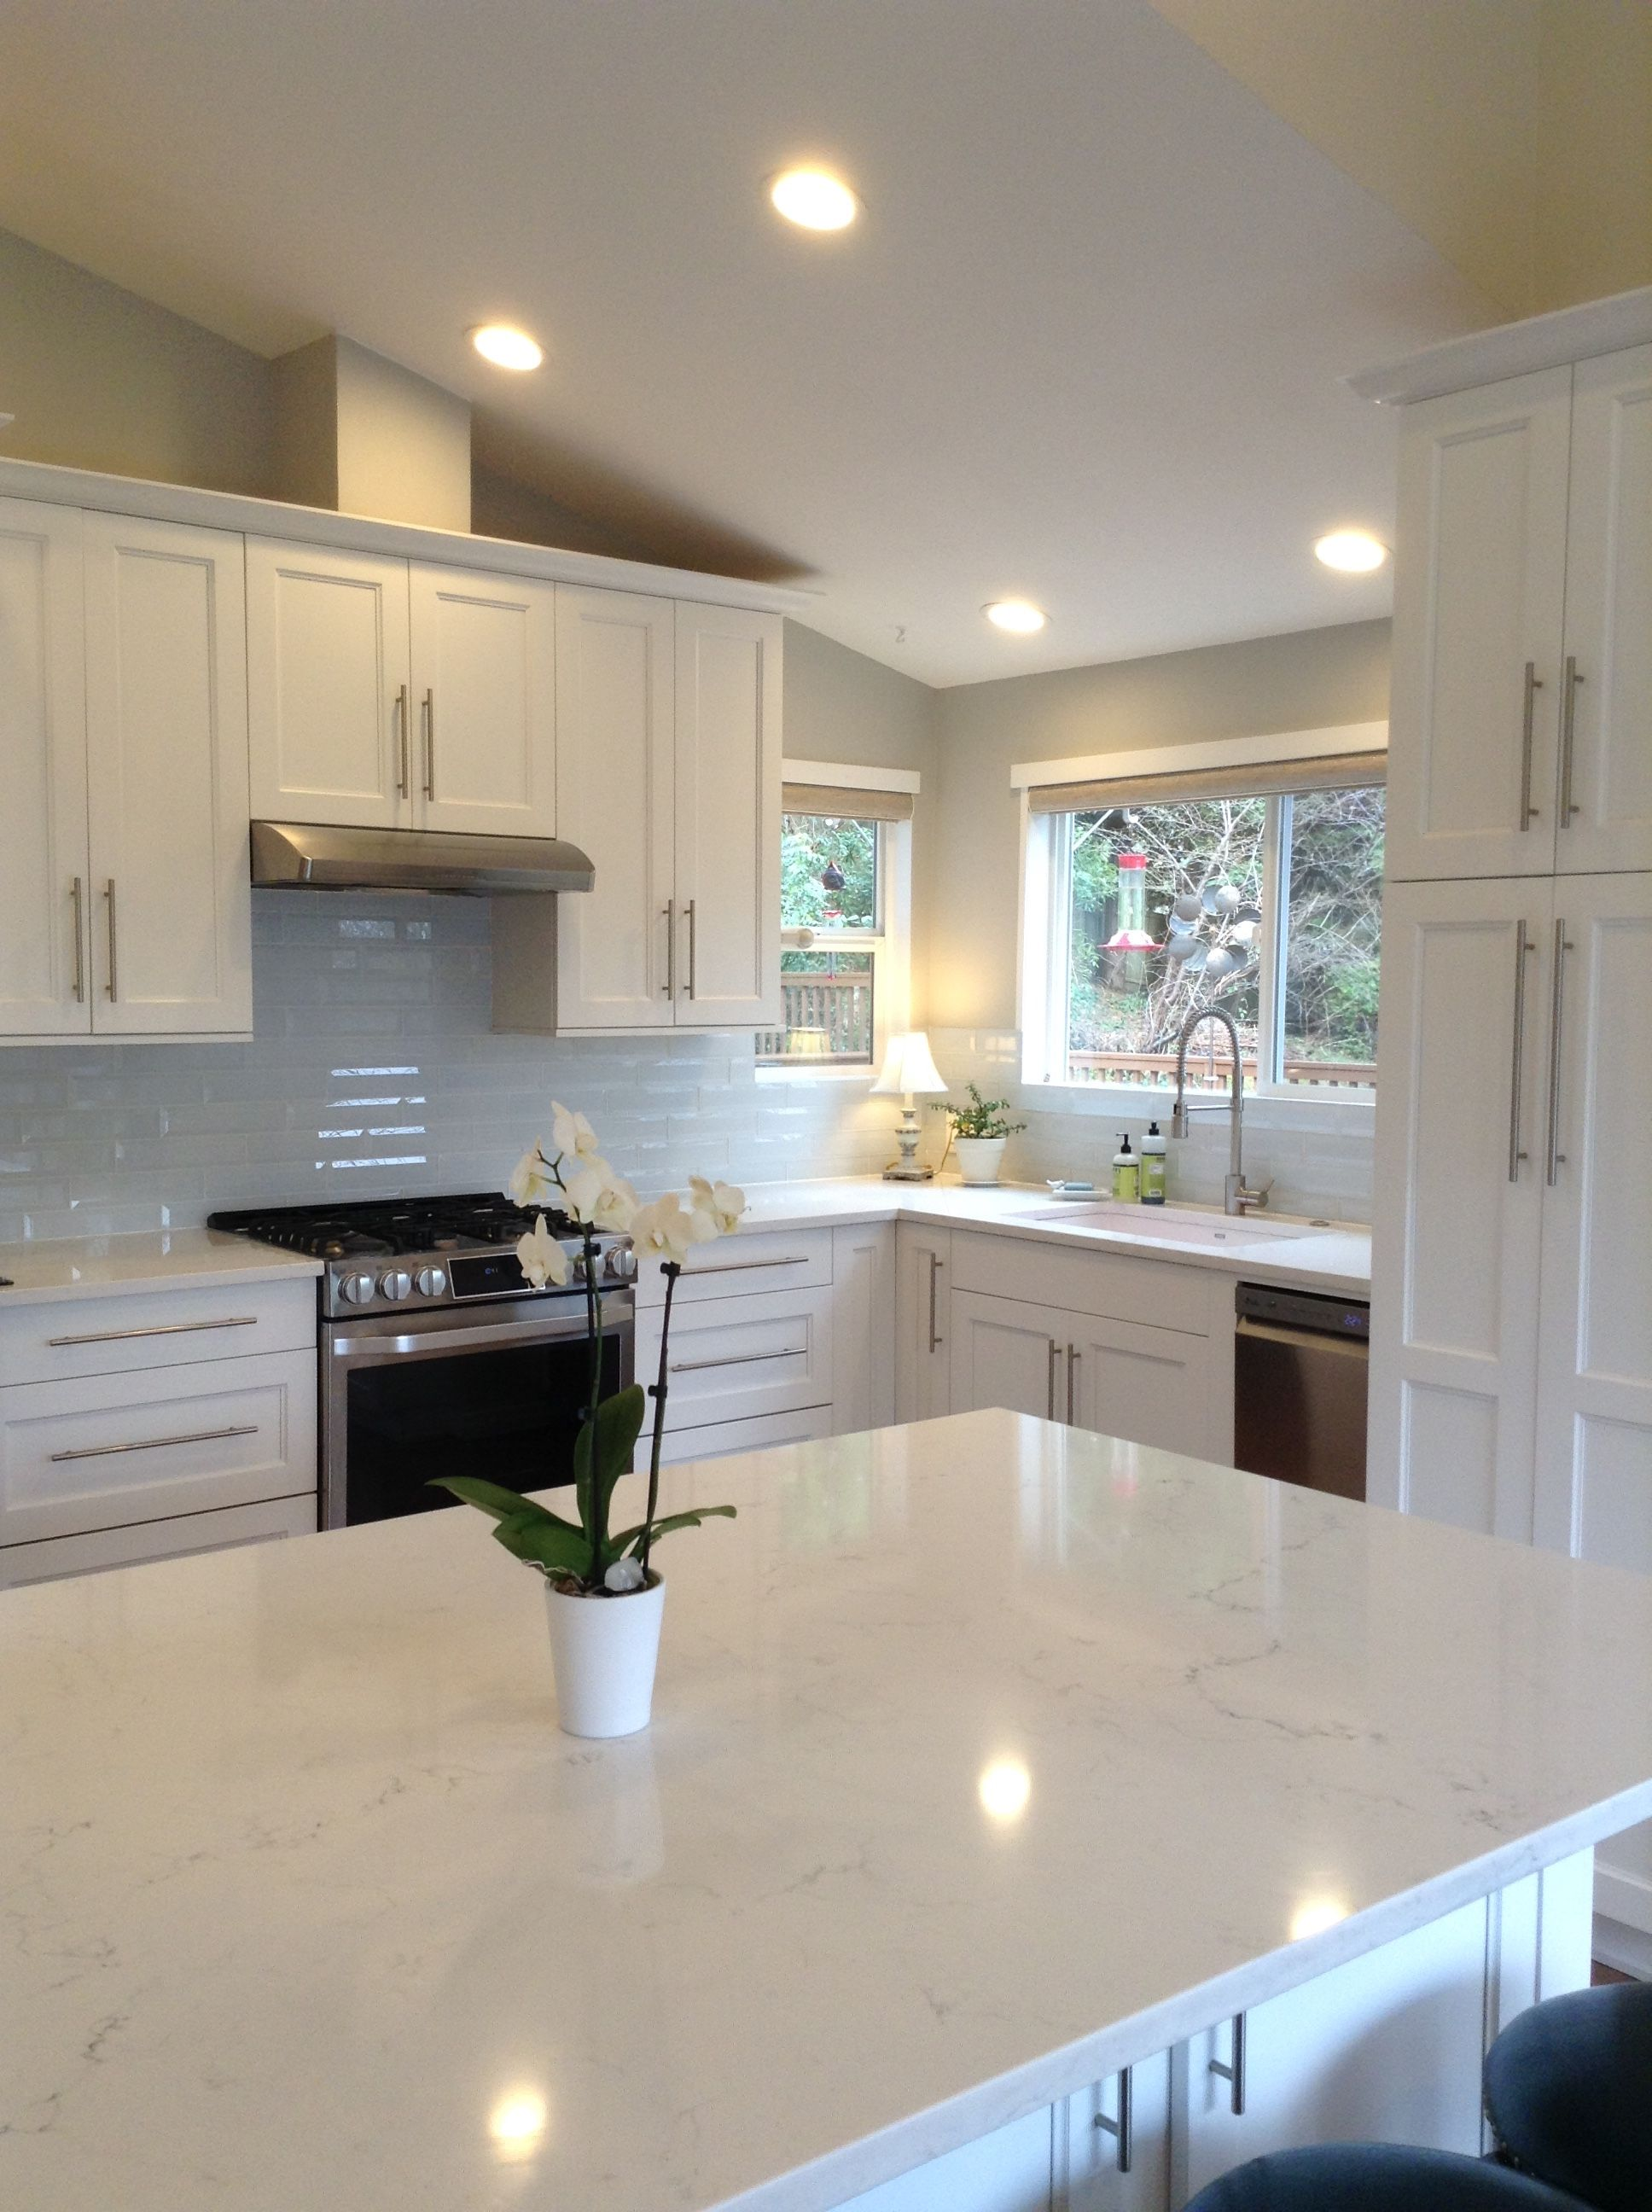 Latitude Cabinets Deco White Paint Kitchen Paint Interior Design Kitchen Kitchen Design Small